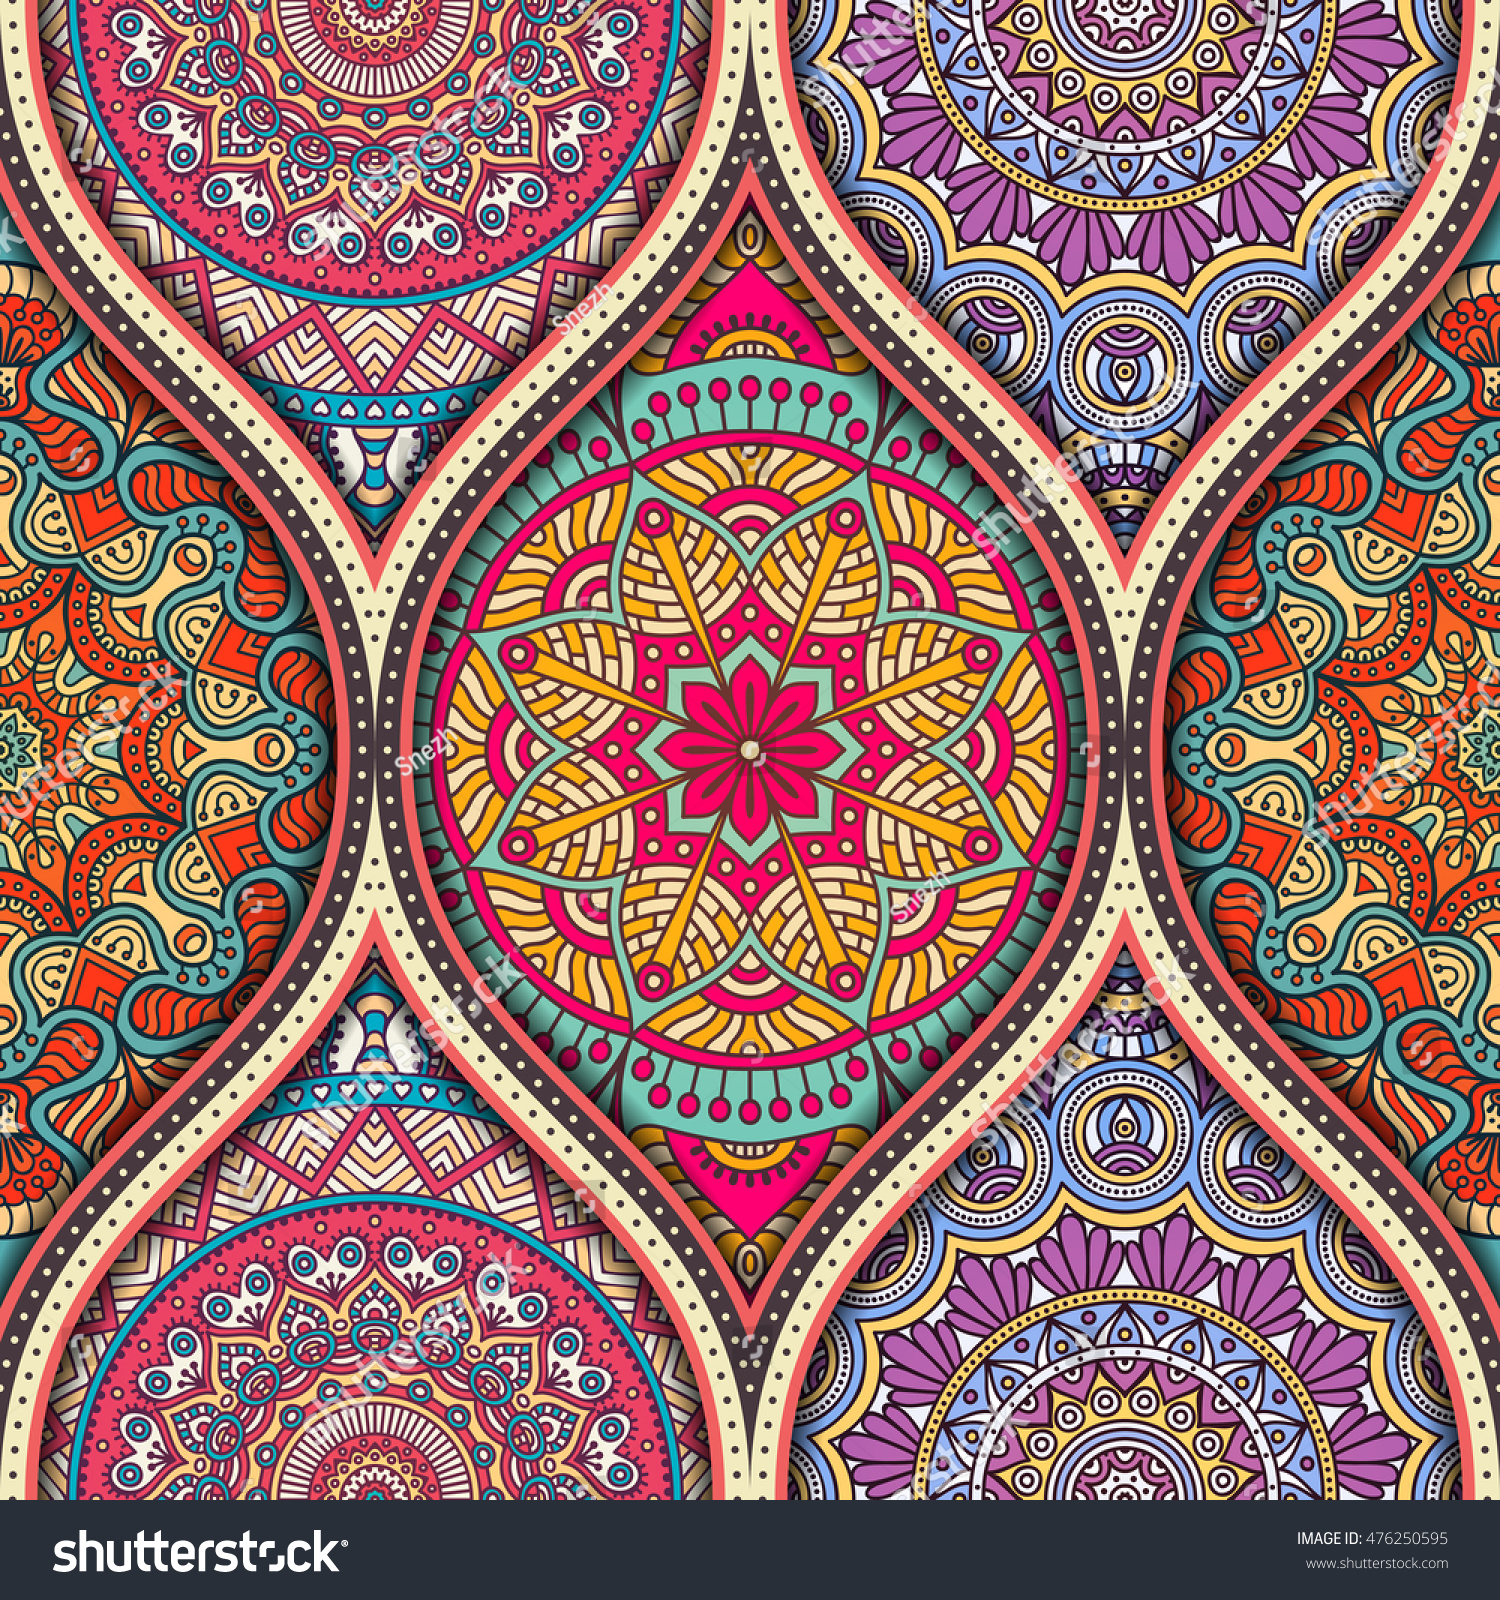 Seamless Pattern Tile Mandalas Vintage Decorative Stock